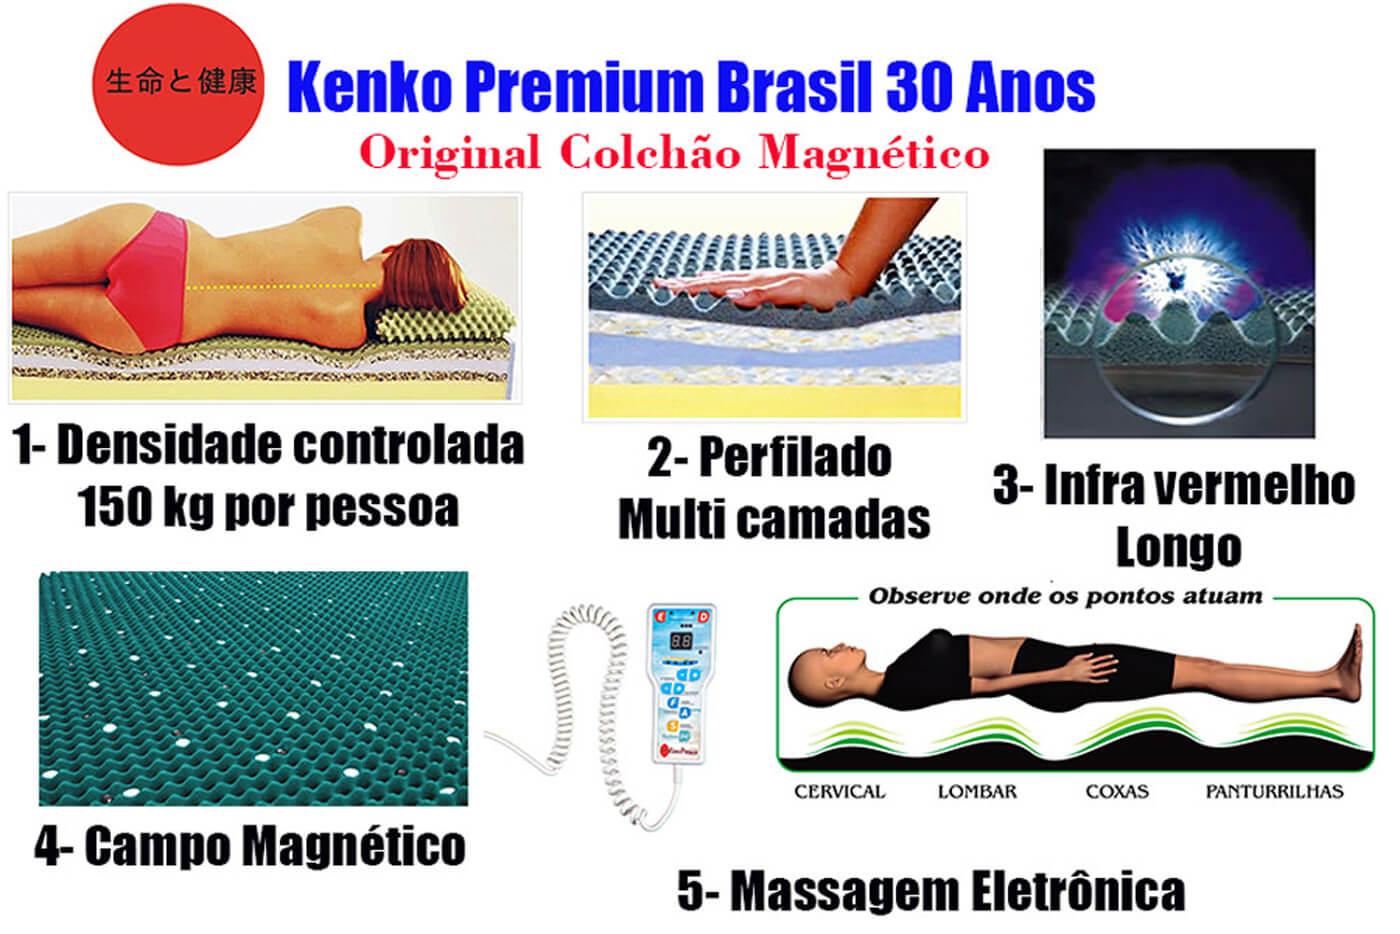 Colchão Magnético Kenko Premium Queen Size 1,58x1,98x27cm Plus C/ Massagem Eletrônica Energia Bioquãntica + Cromoterapia  - Kenko Premium Colchões